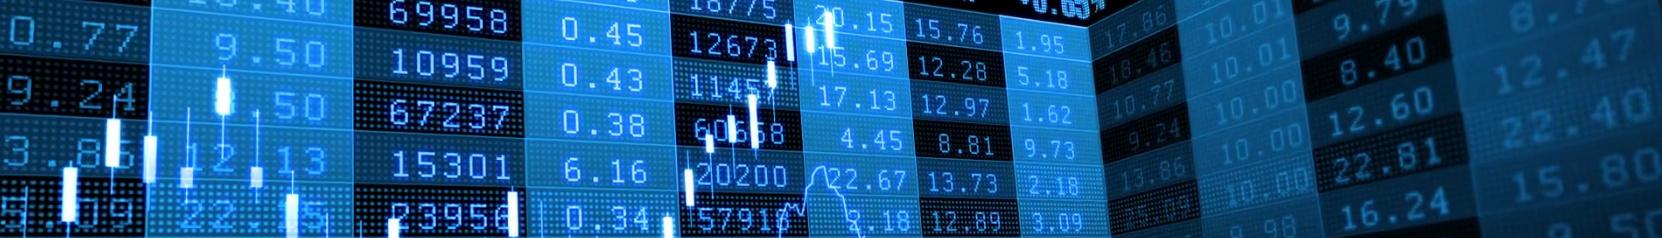 Top Breakout Stocks